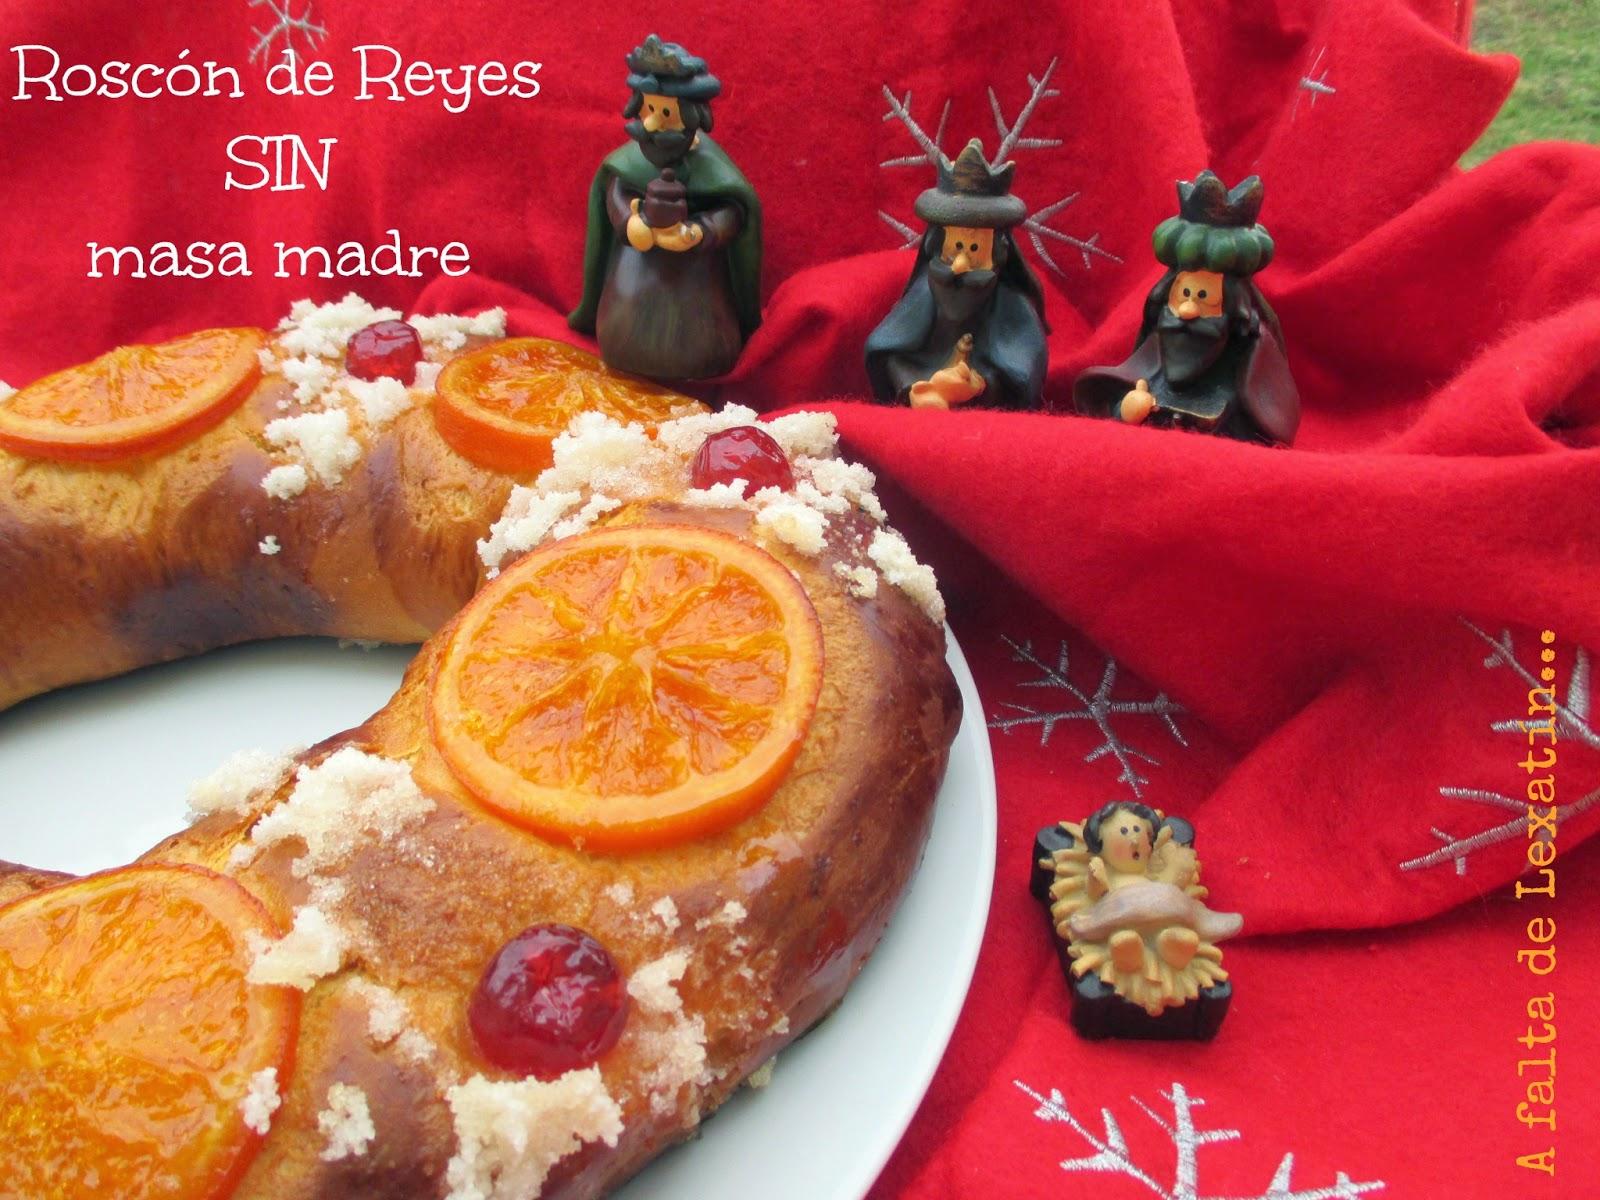 Roscón de Reyes sin masa madre